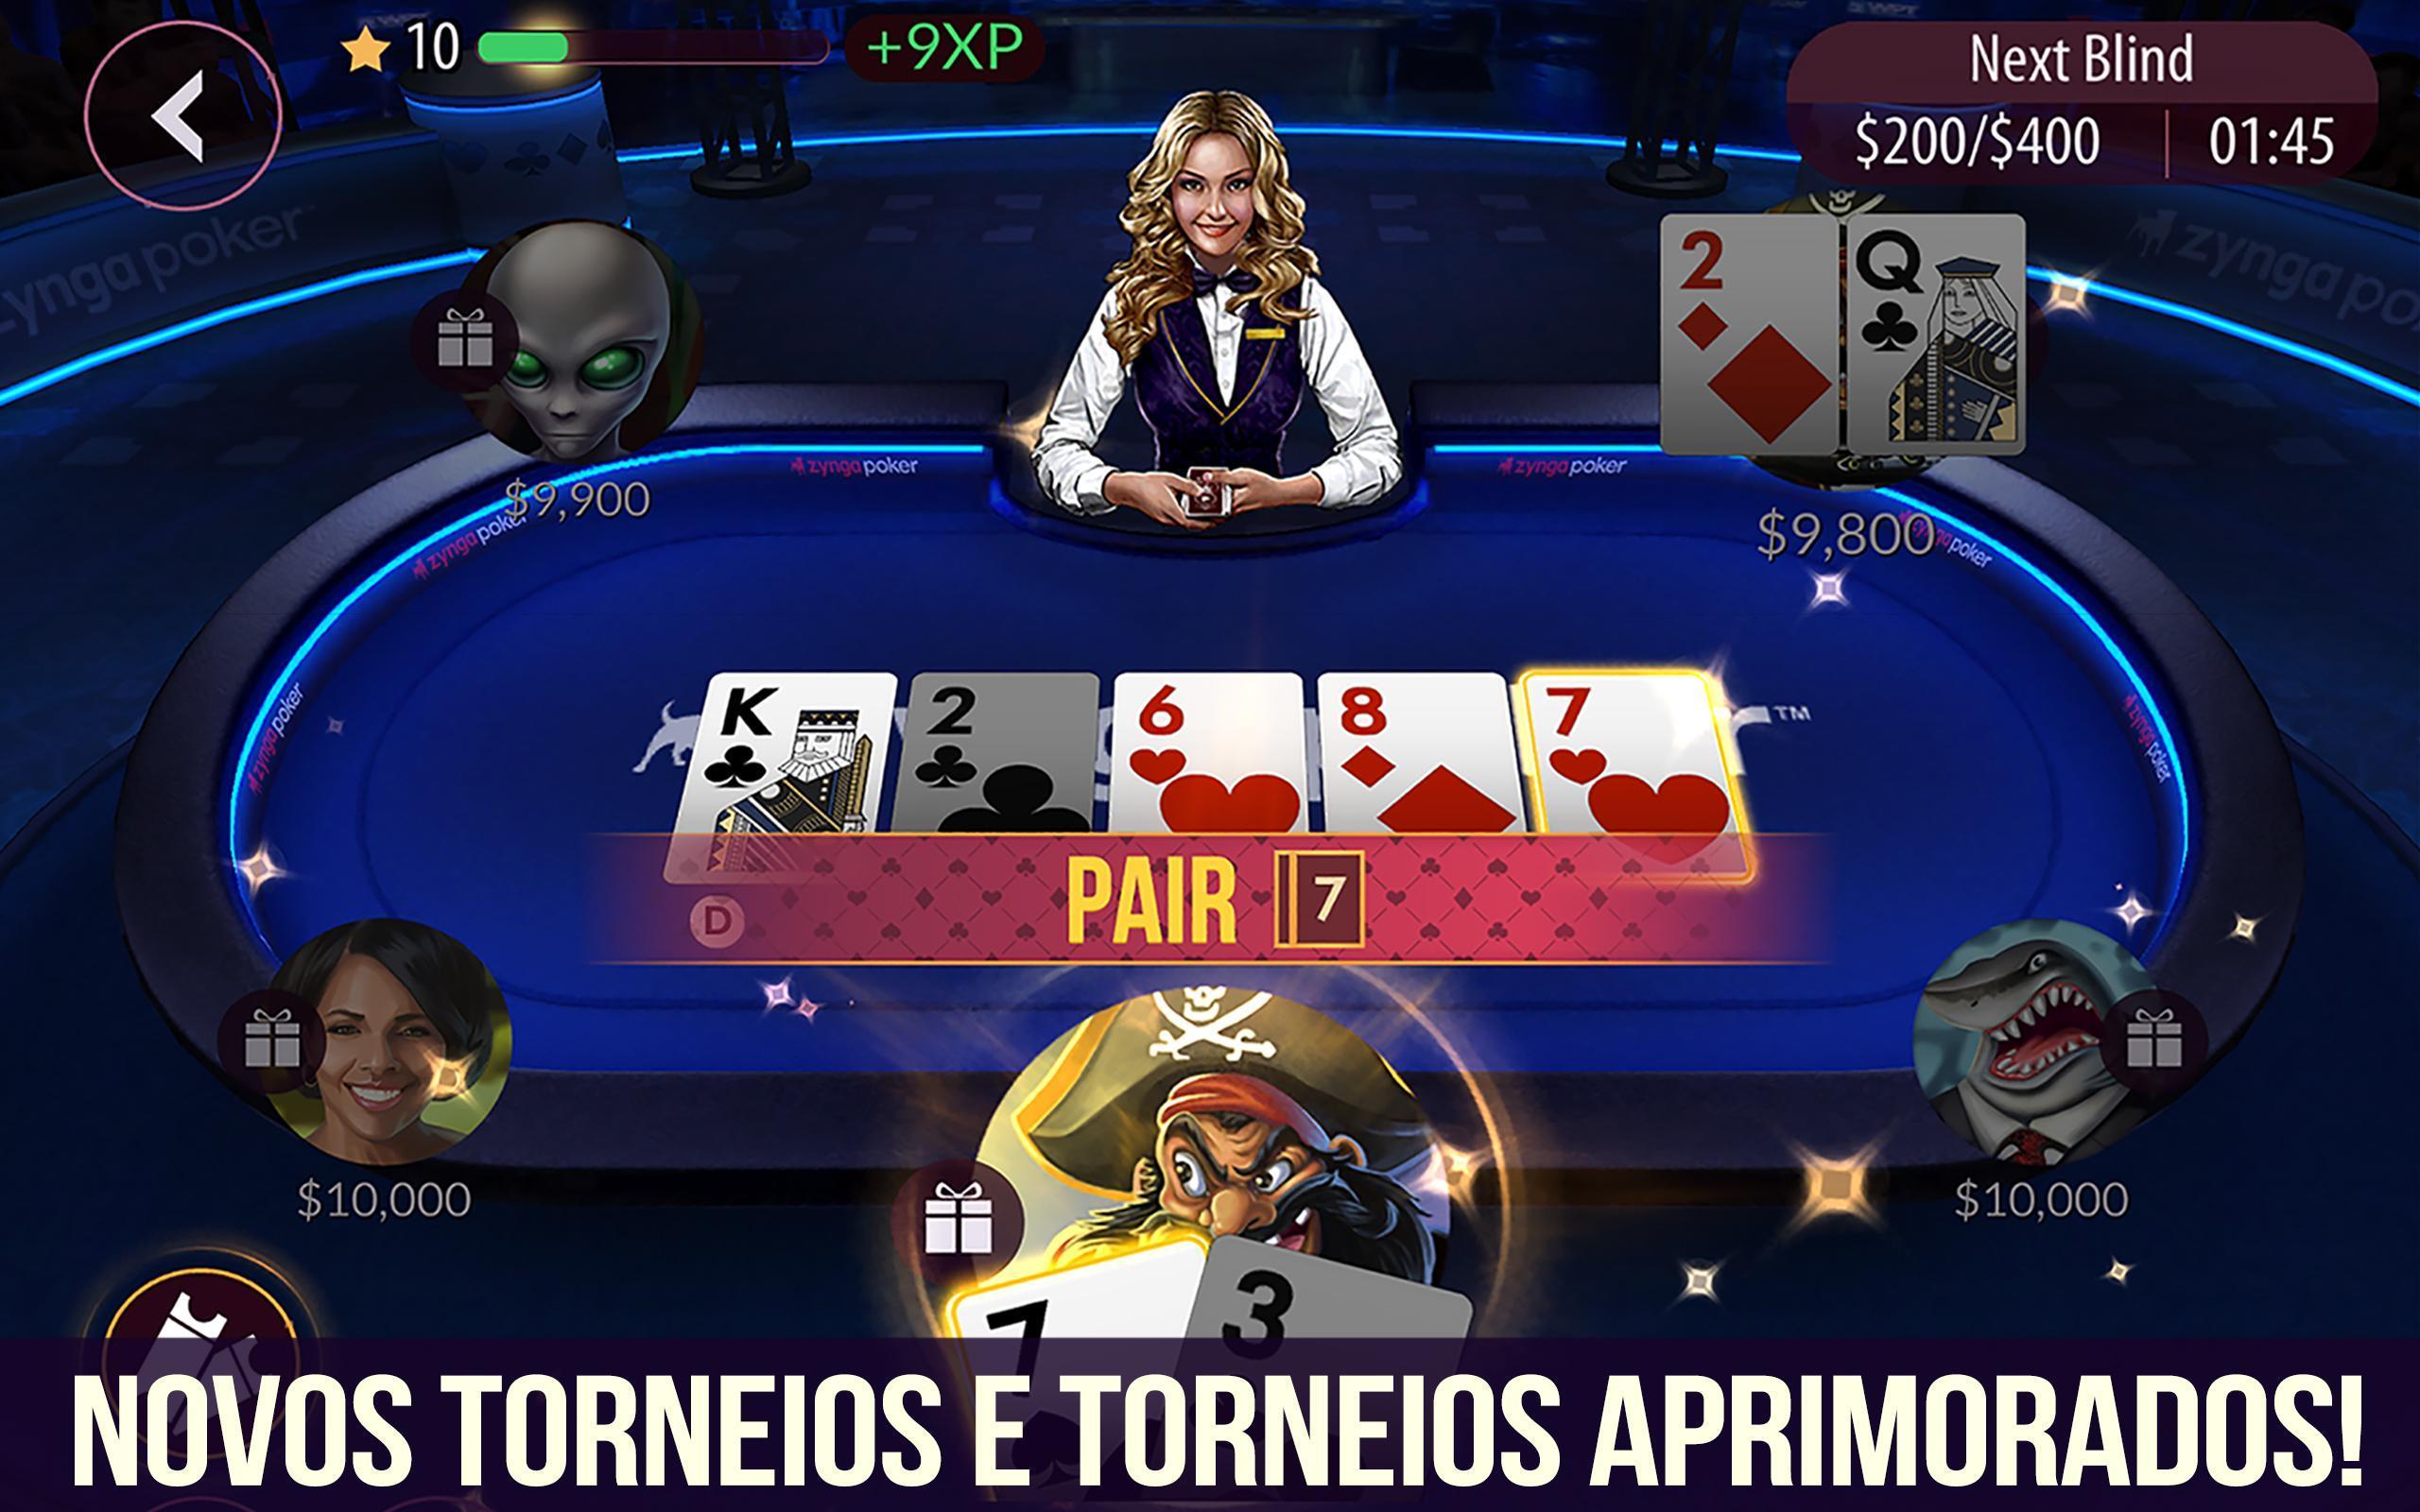 Jogos de casino poker gratis cheat online casino software